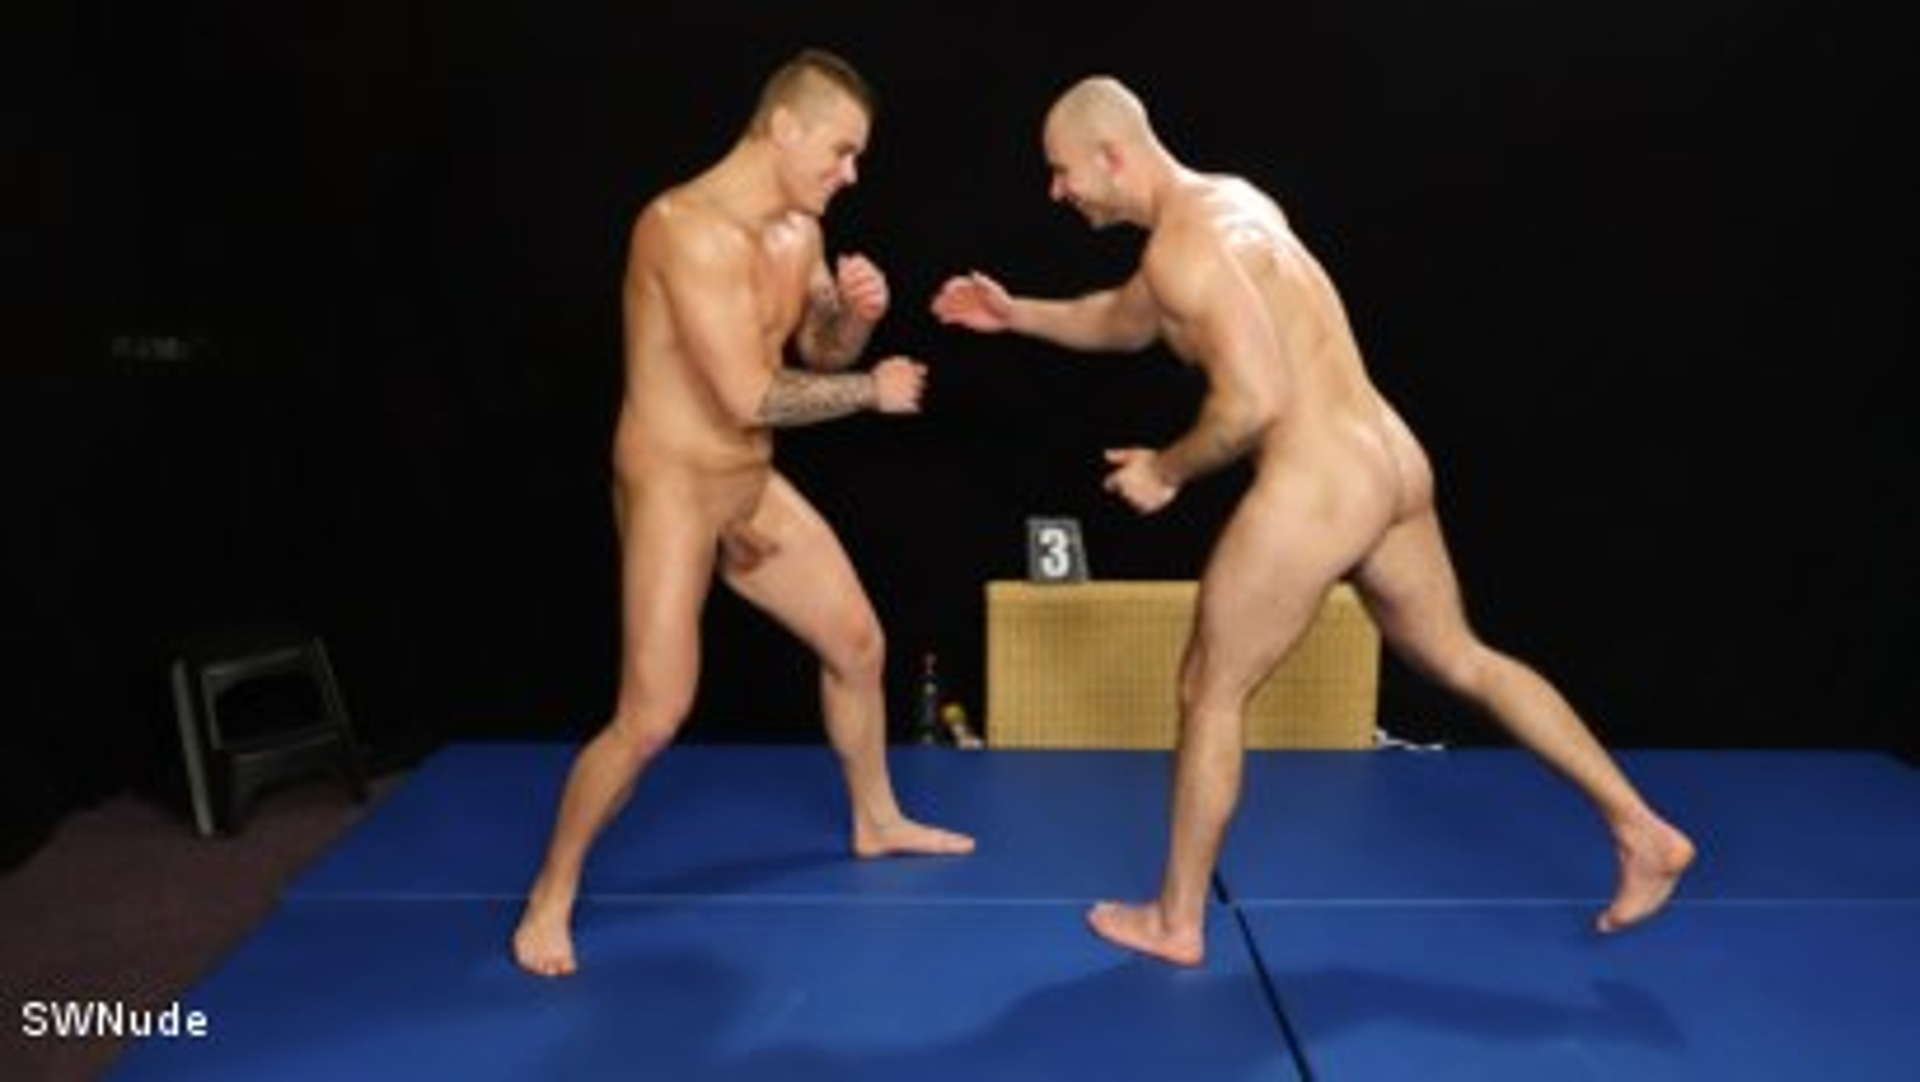 Photo number 4 from Jindra vs Marek - WRESTLING shot for swnude on Kink.com. Featuring Jindra Durak and Marek Borek in hardcore BDSM & Fetish porn.